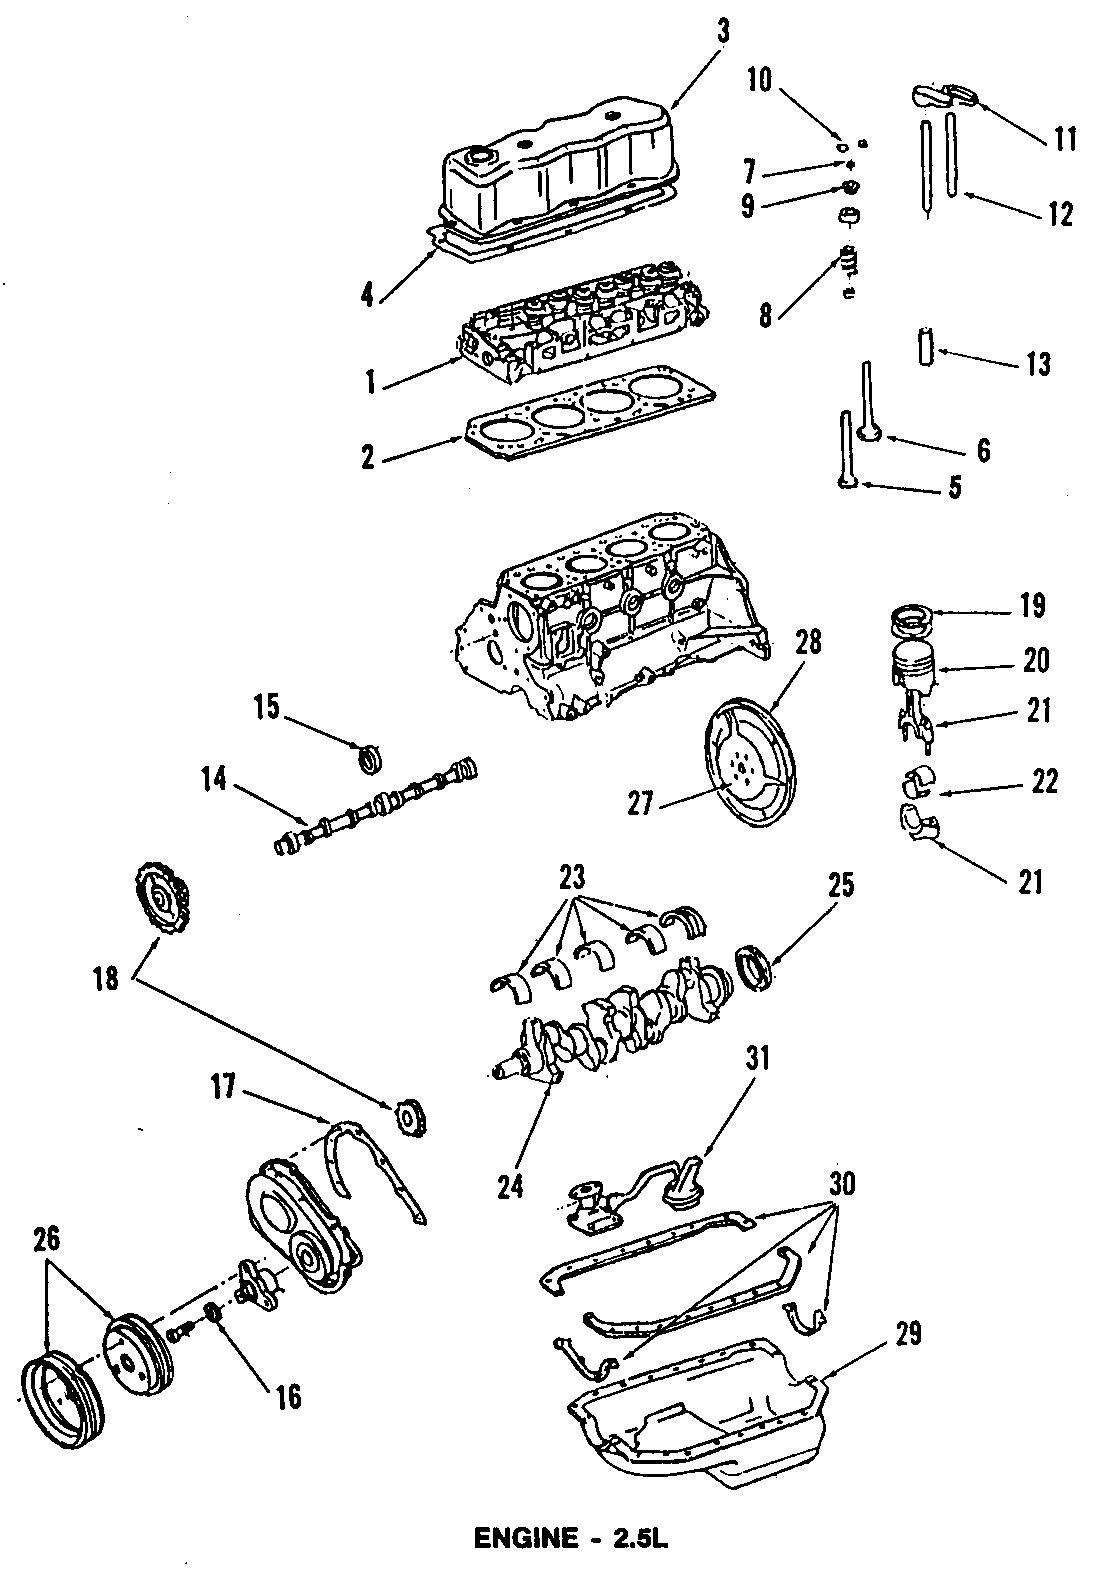 Chevrolet S10 Blazer Engine Camshaft Follower Lower